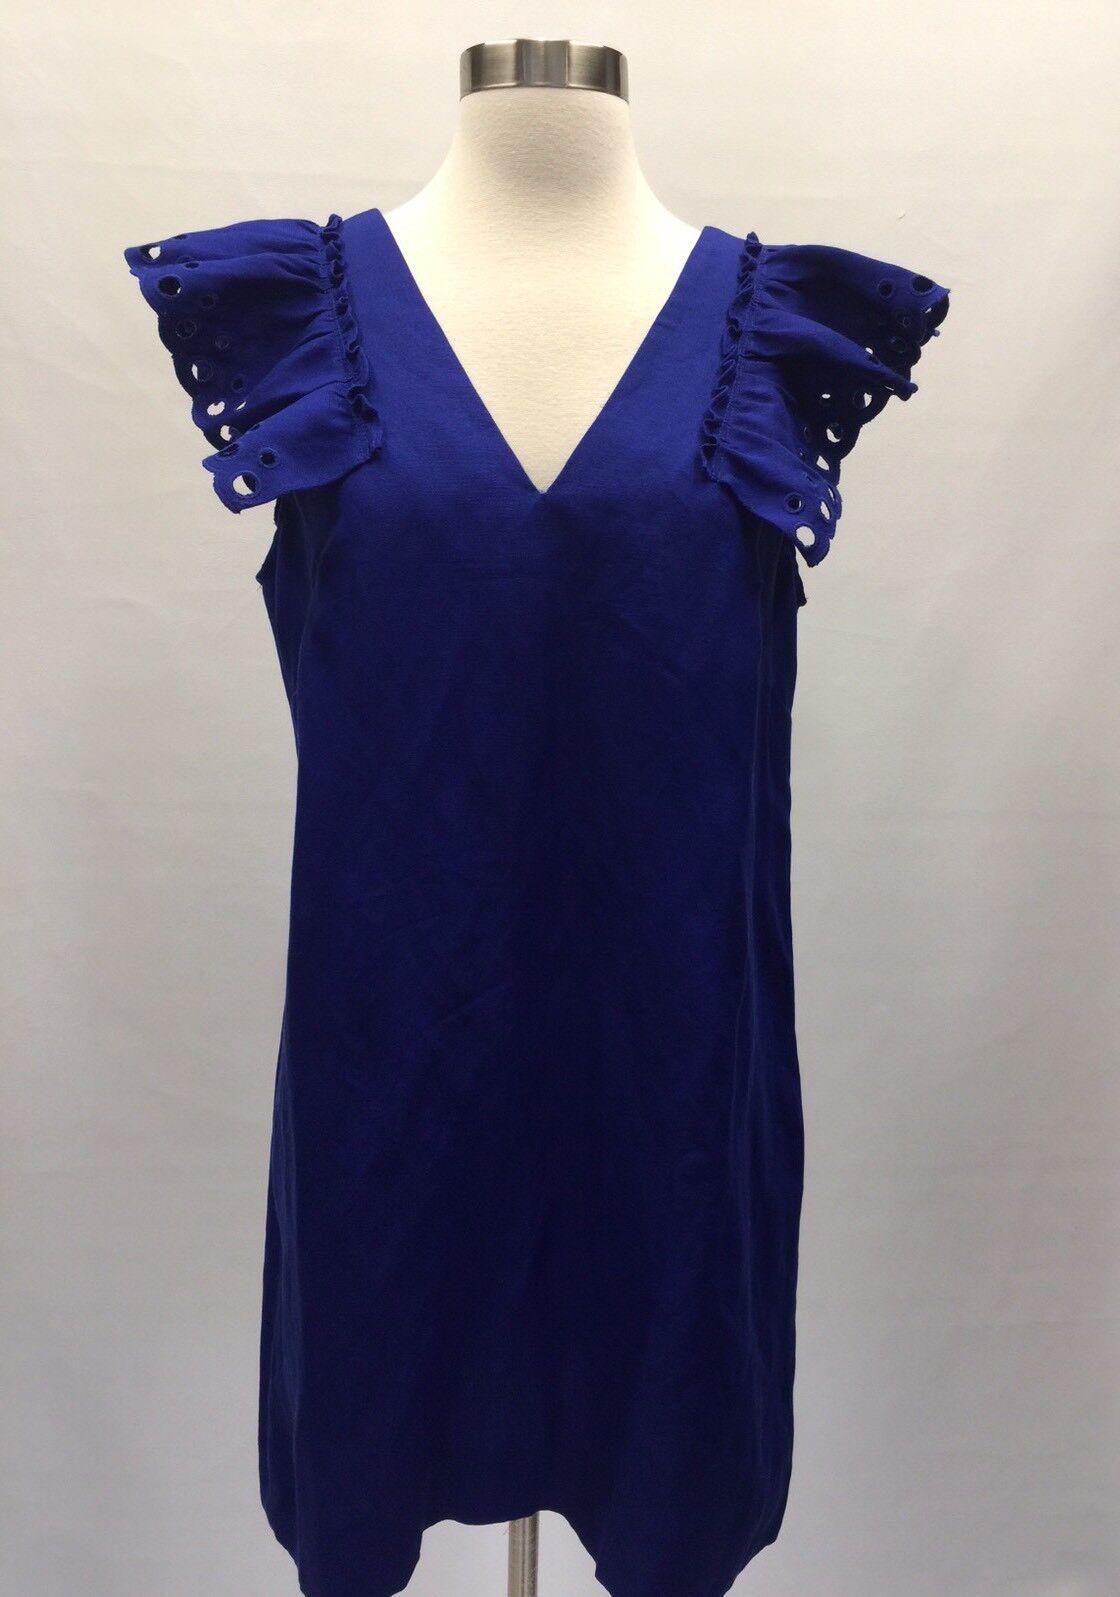 New JCREW COLLECTION Petite ruffle-shoulder sheath dress Blau G6654 10P Sold Out